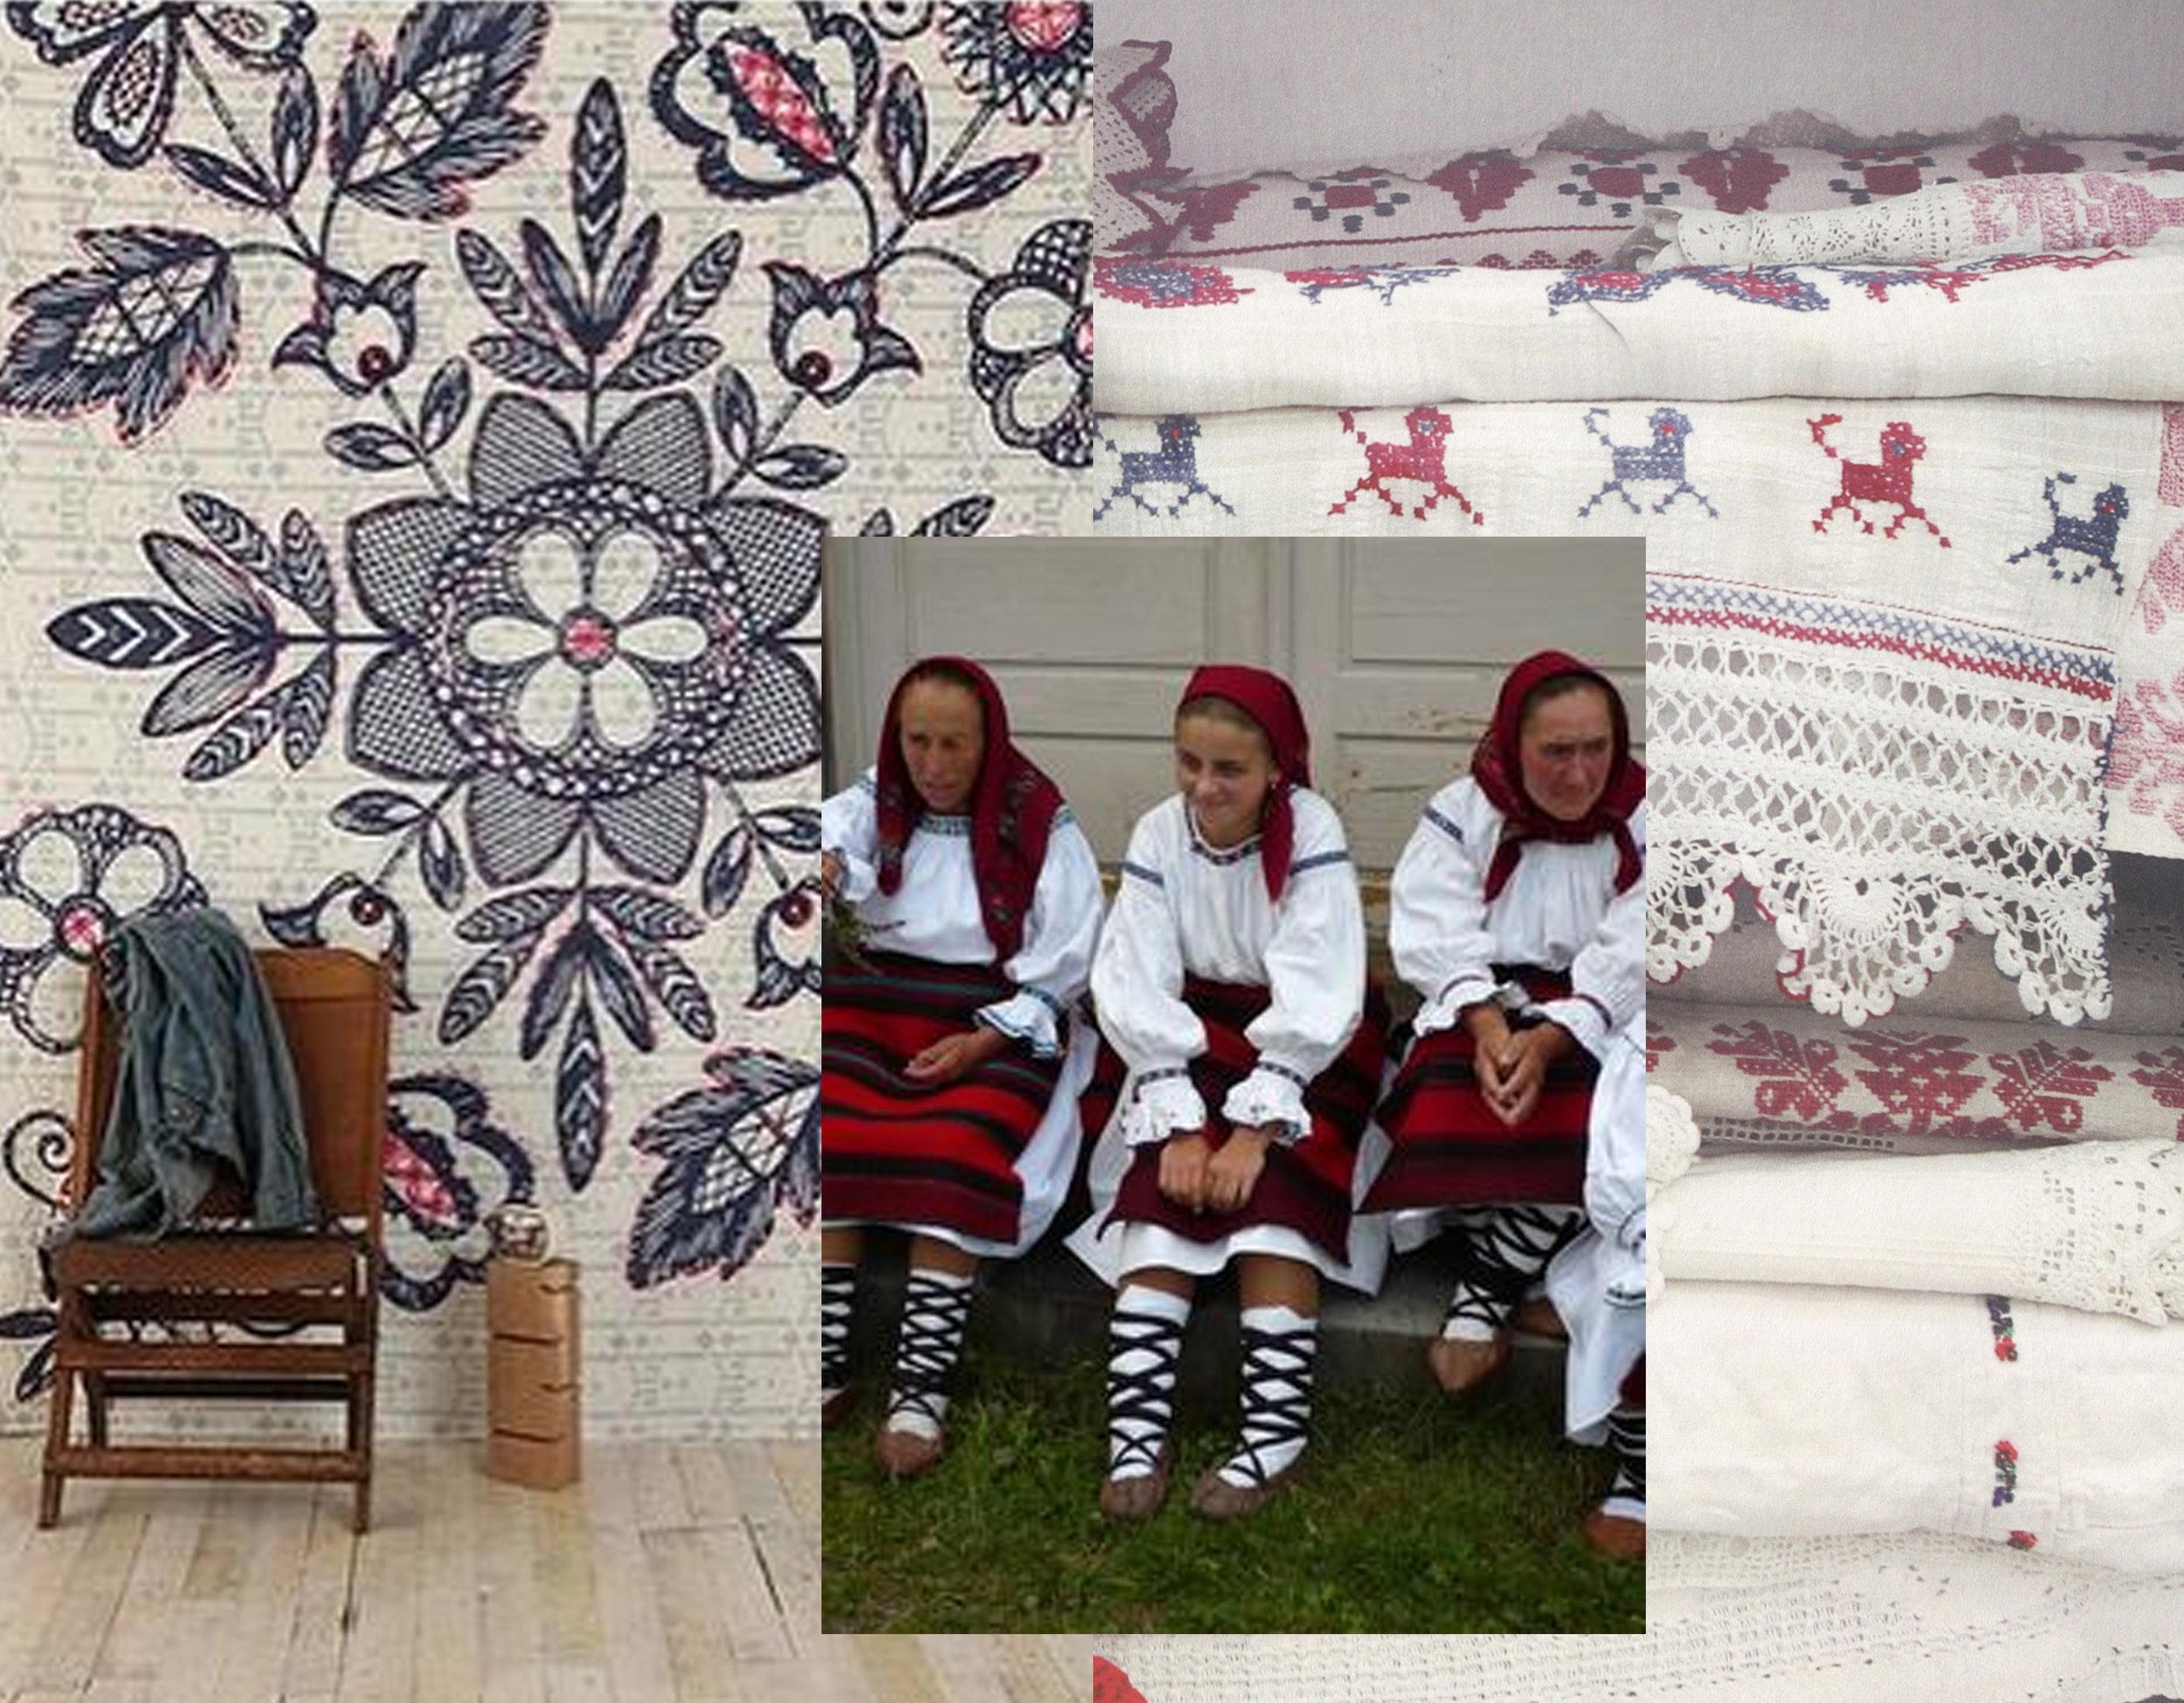 mural via  Cafe Cartolina  - emboideries out of book Peasant museum Bucarest - women traditional cloths via  Grad daniela